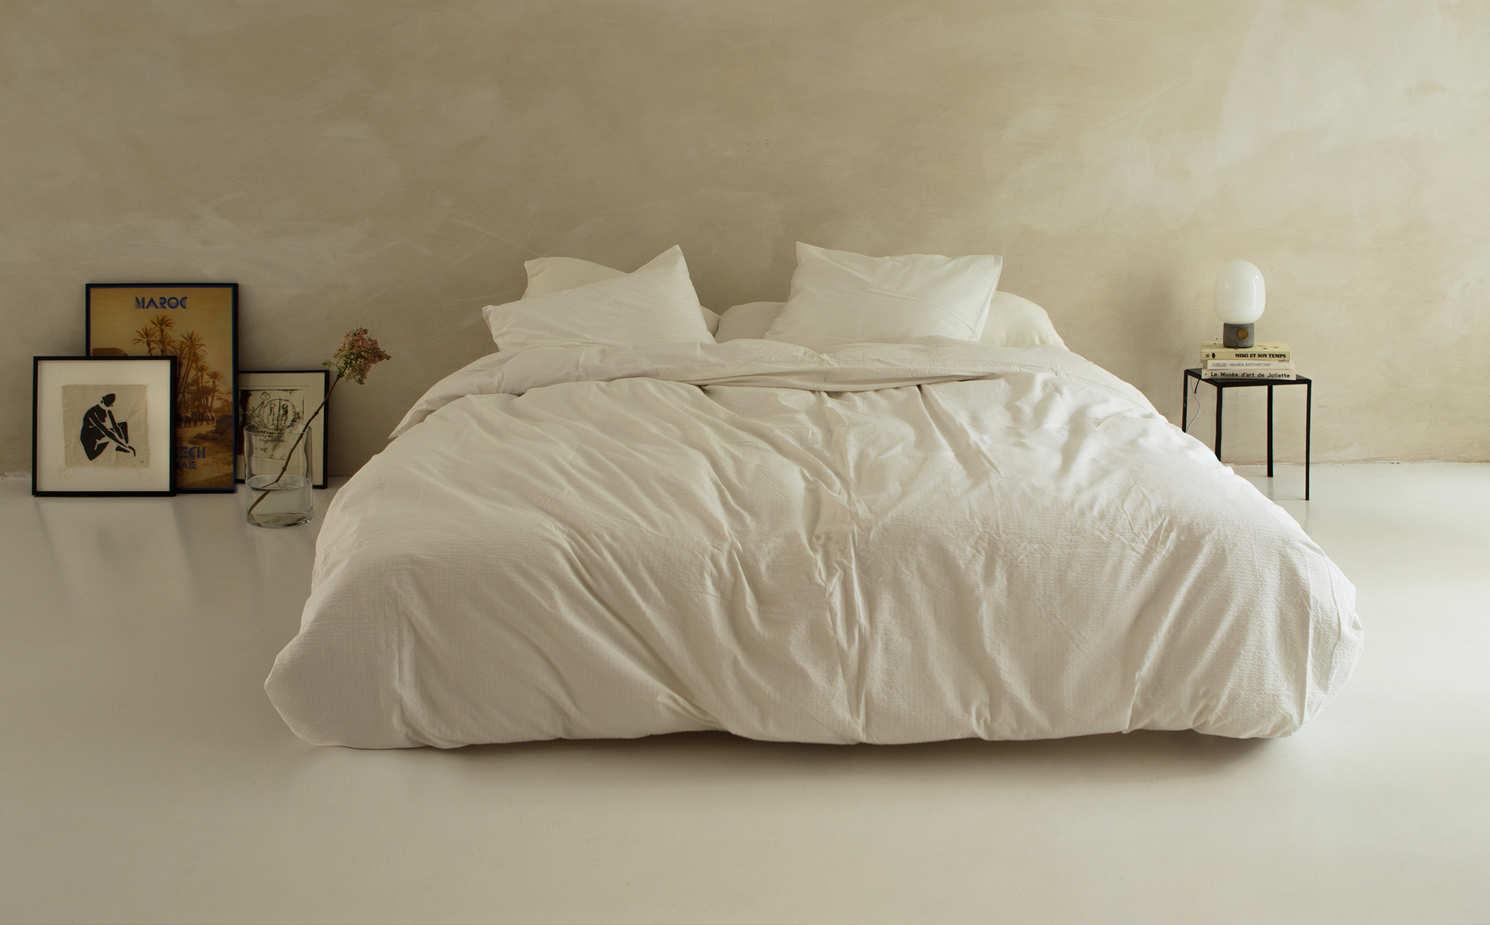 Sleep all night with the Crisp Sheet duvets / more details via @kronekern